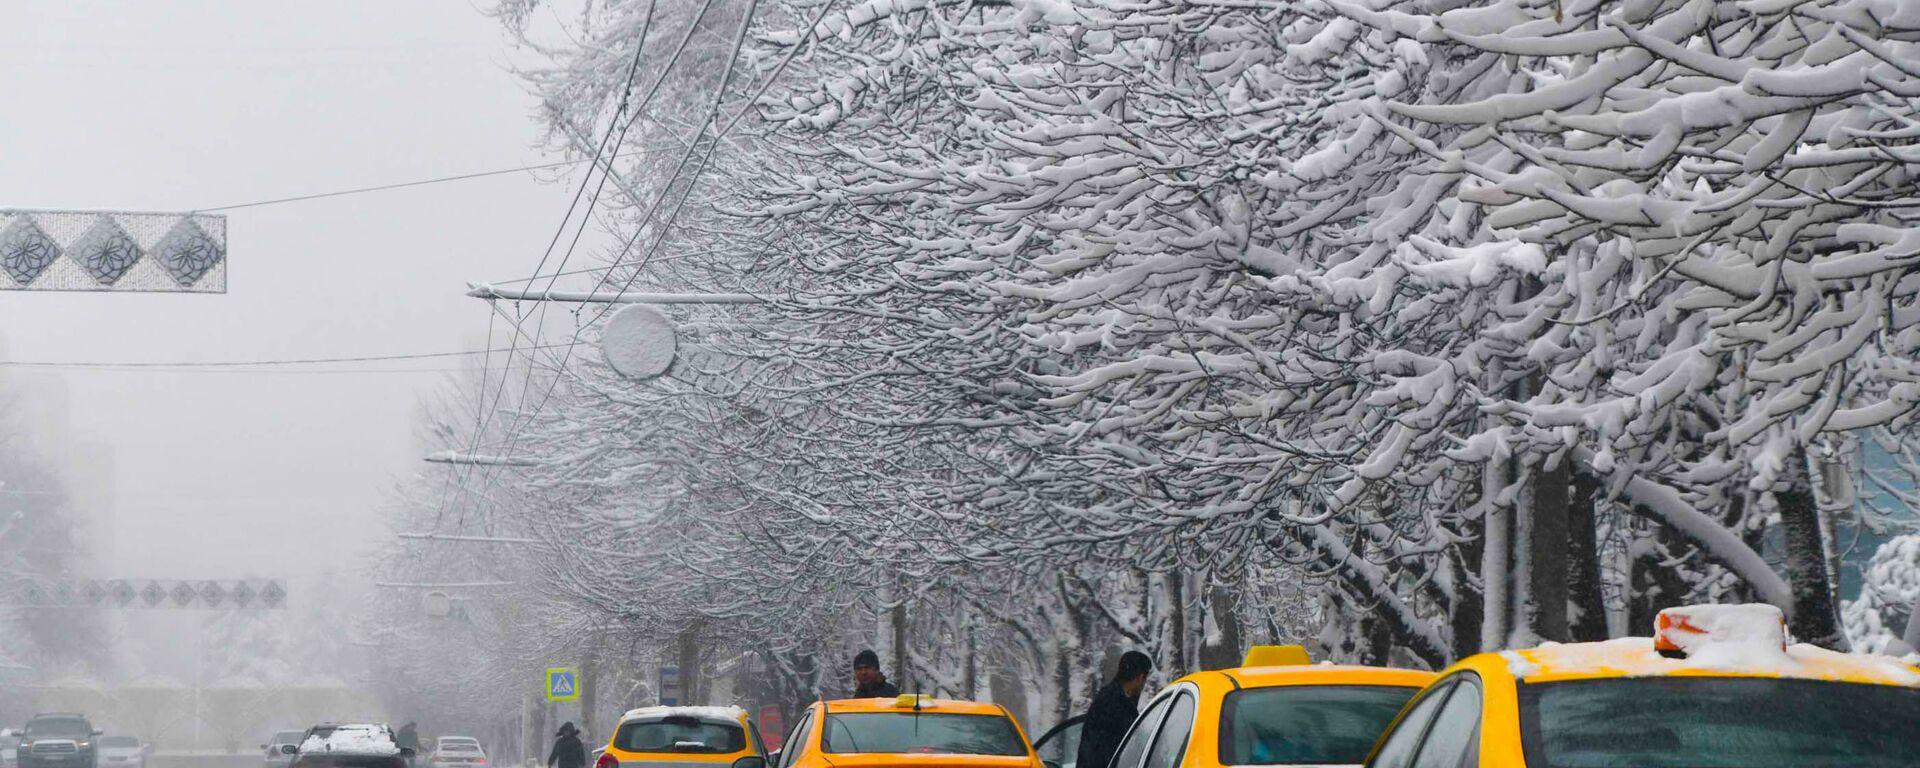 Зима в городе Душанбе - Sputnik Тоҷикистон, 1920, 17.02.2021